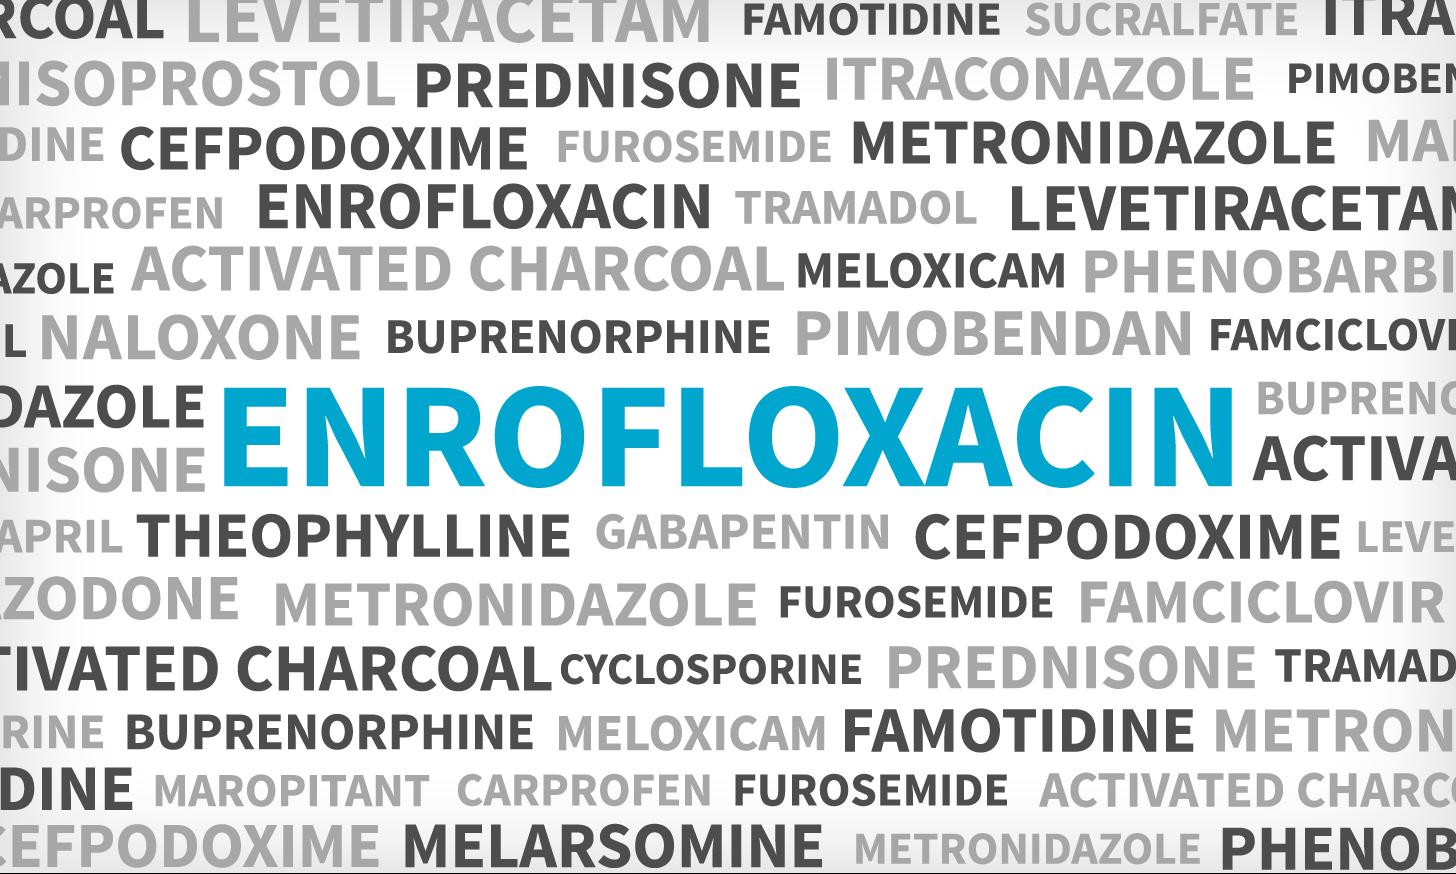 Enrofloxacin (Baytril)